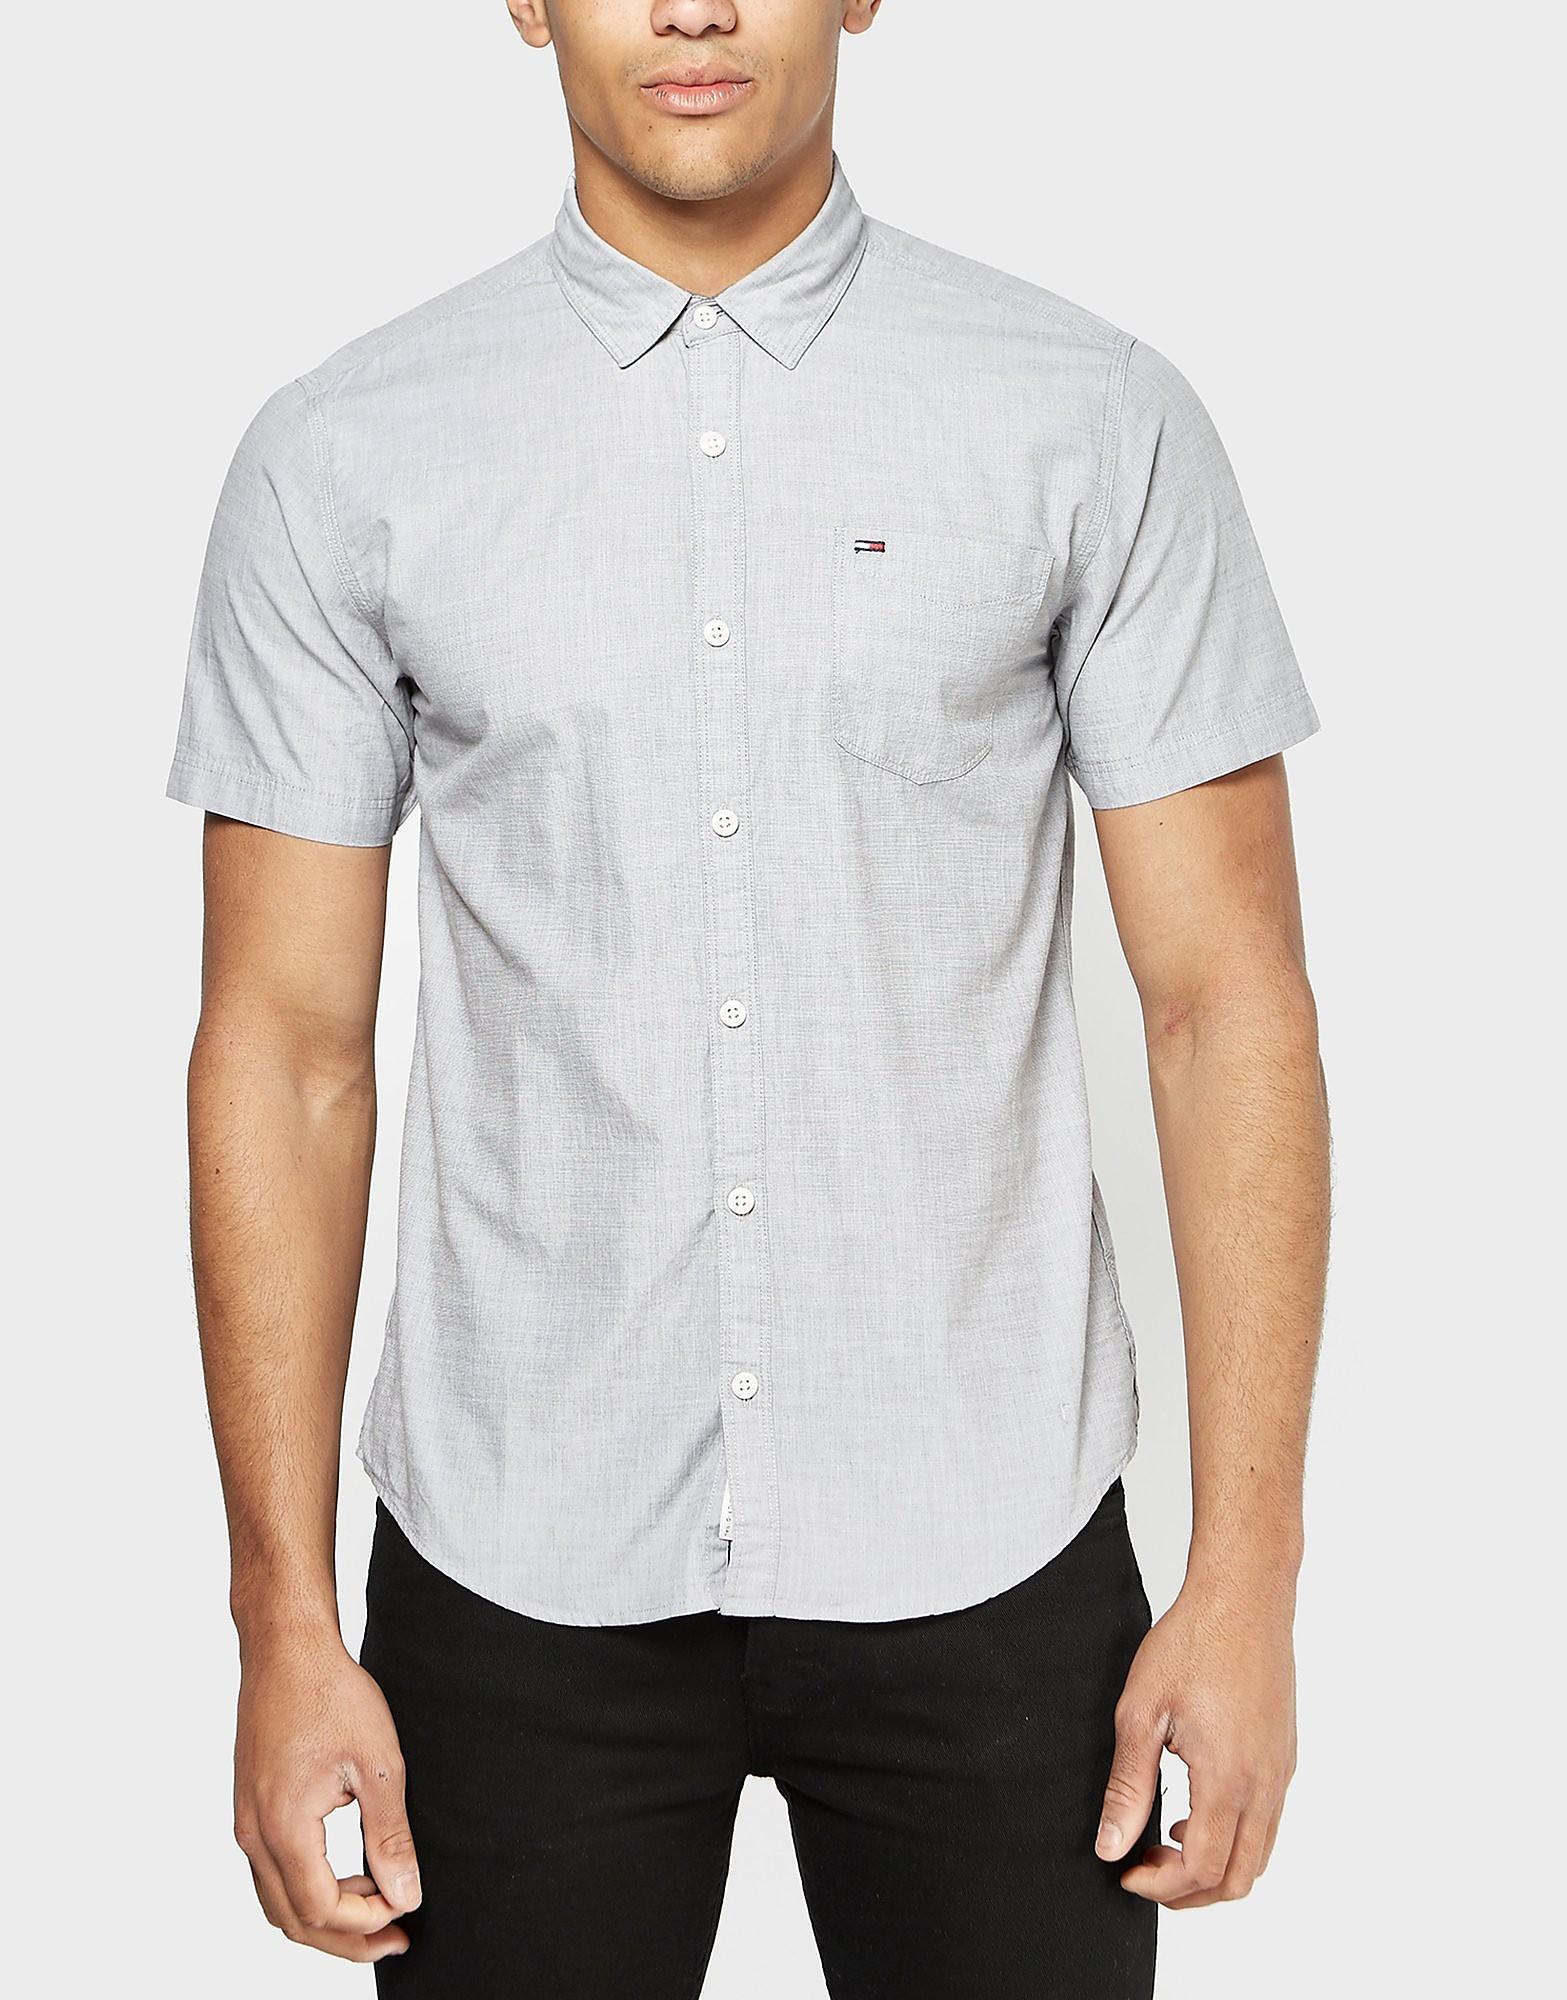 Tommy Hilfiger Basic Short Sleeve Shirt